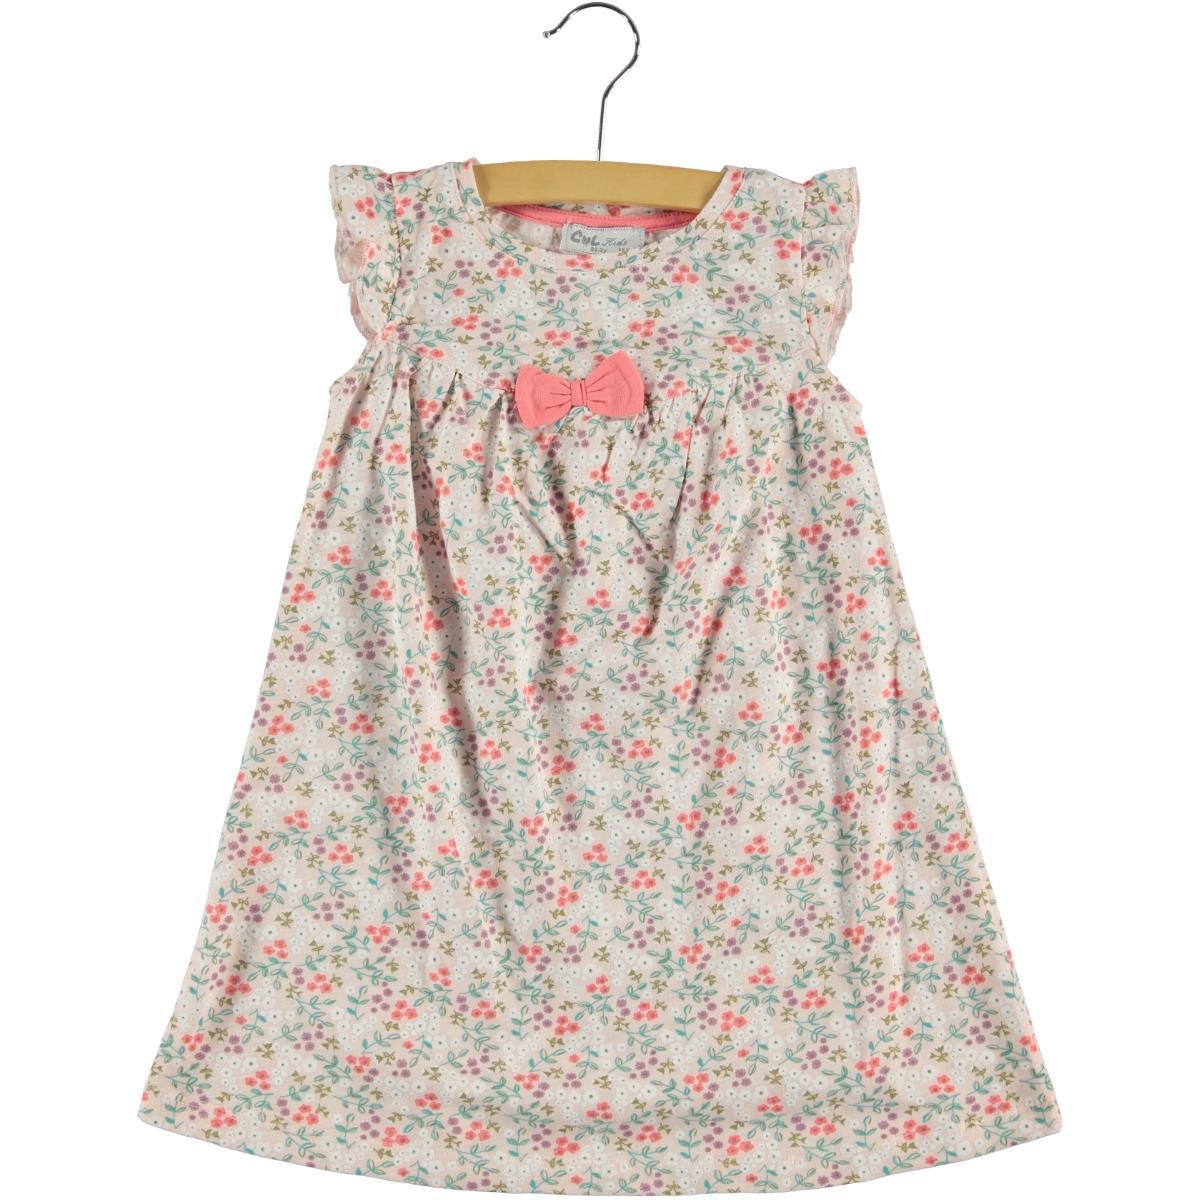 Cvl Powder Pink Girl Dress For 2-5 Age